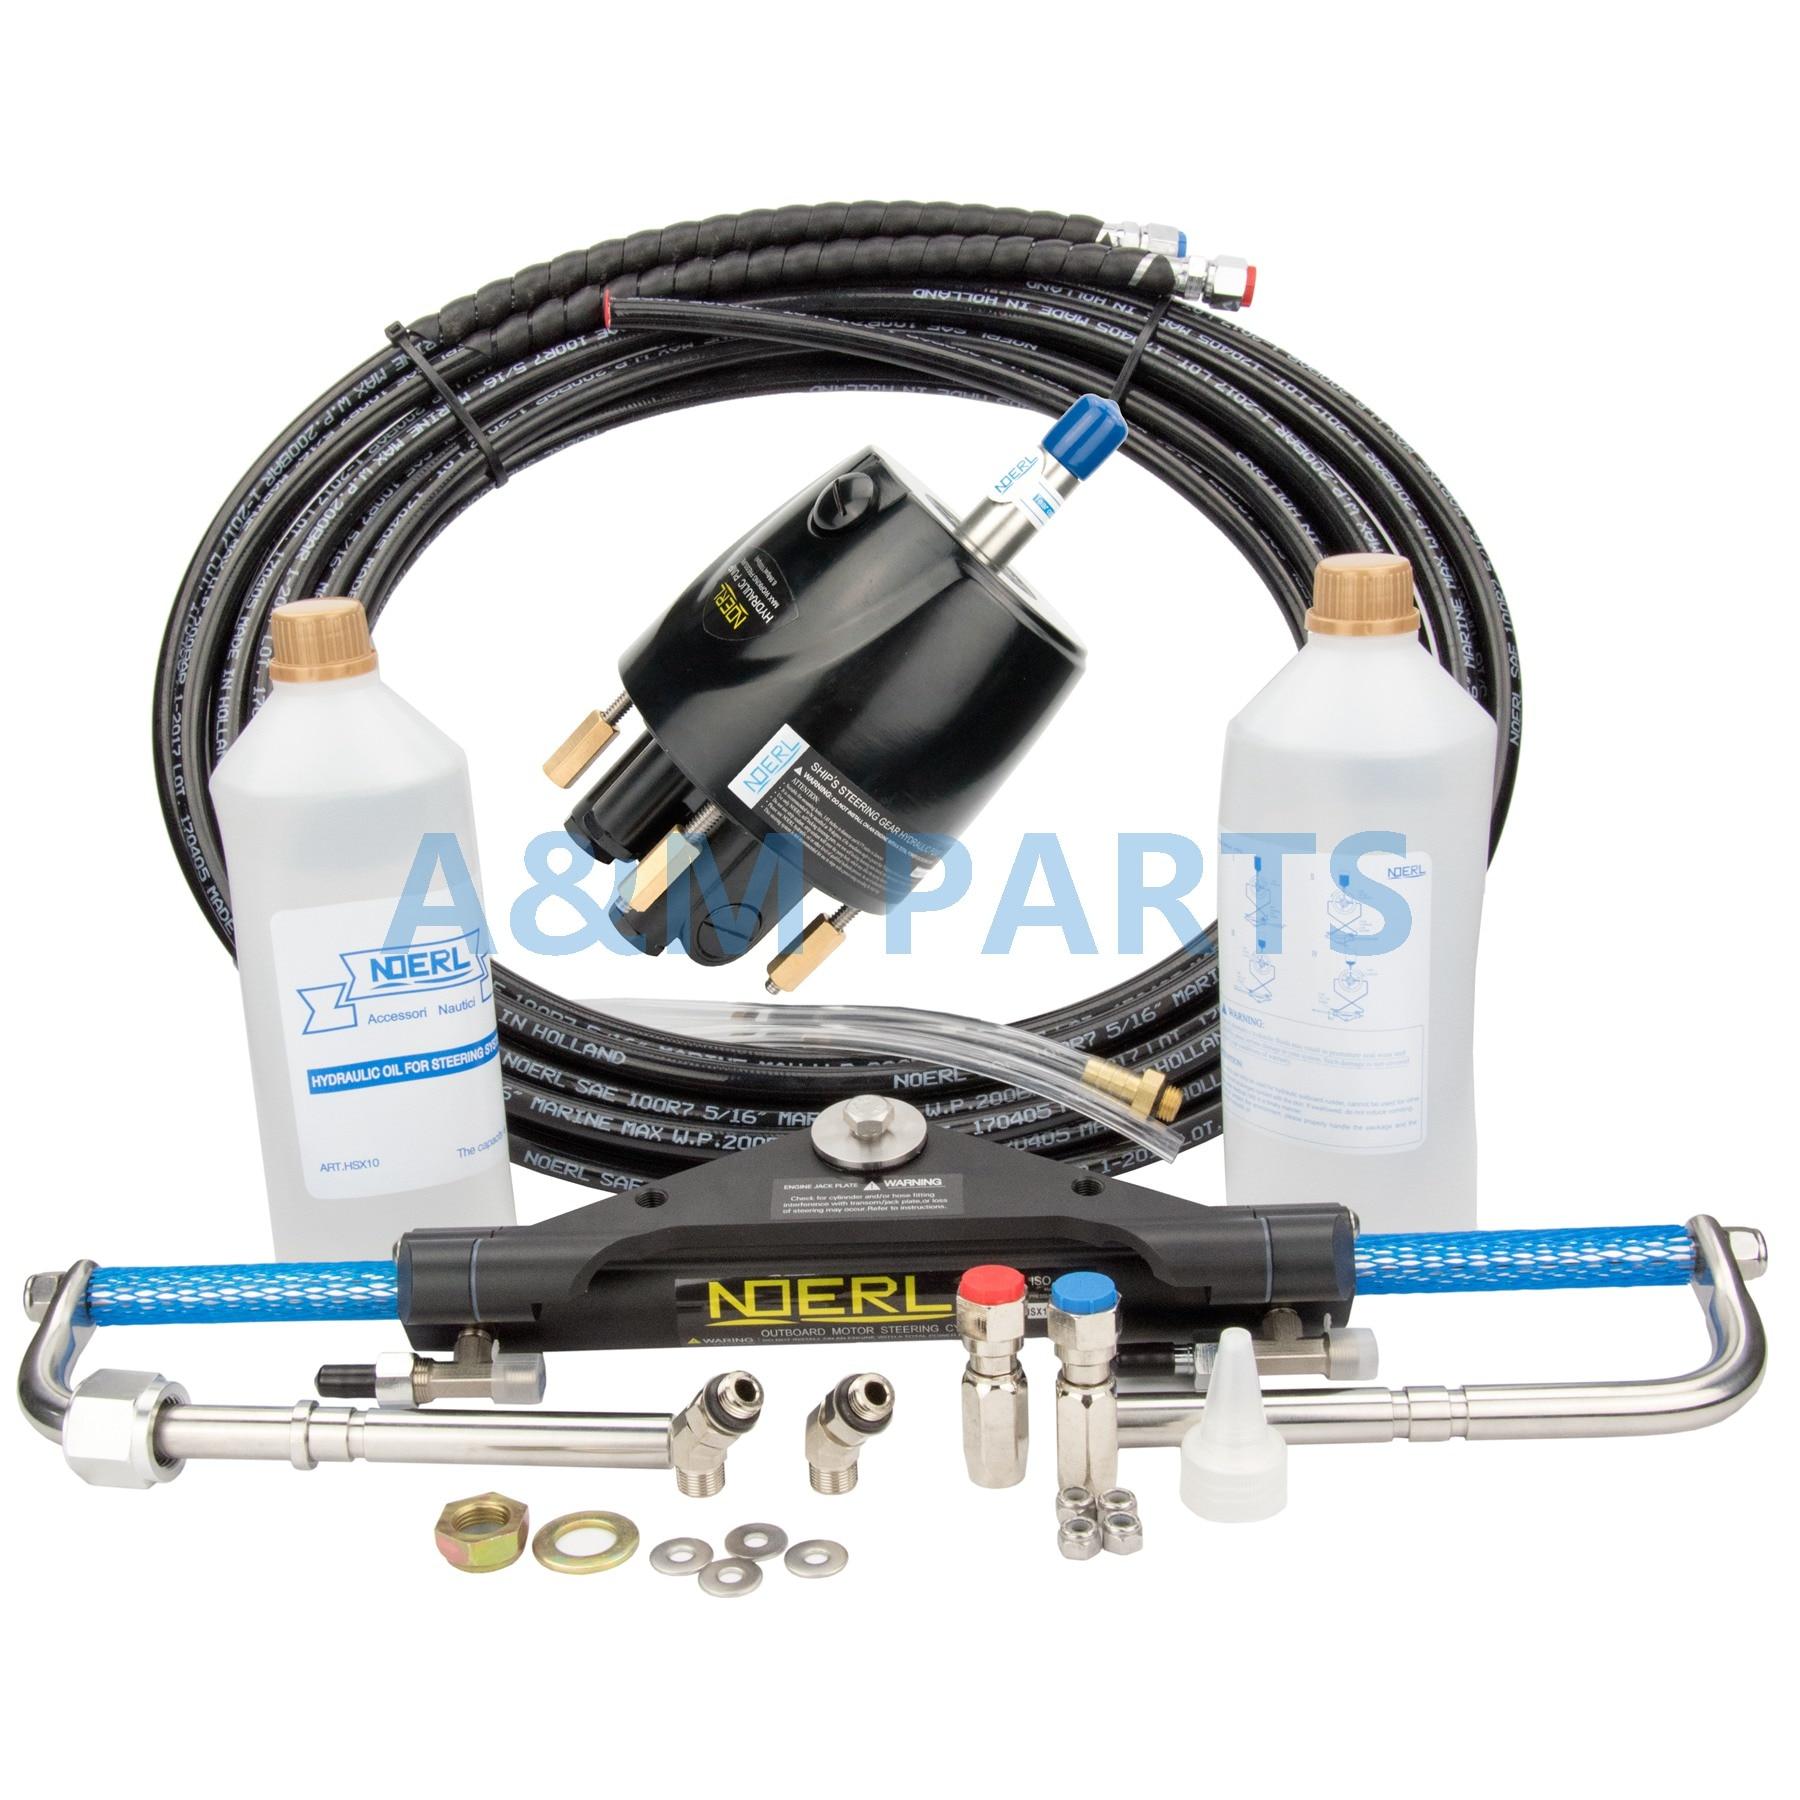 купить Boat Marine Hydraulic Outboard Steering System Kit Cylinder Helm 150HP по цене 36953.31 рублей